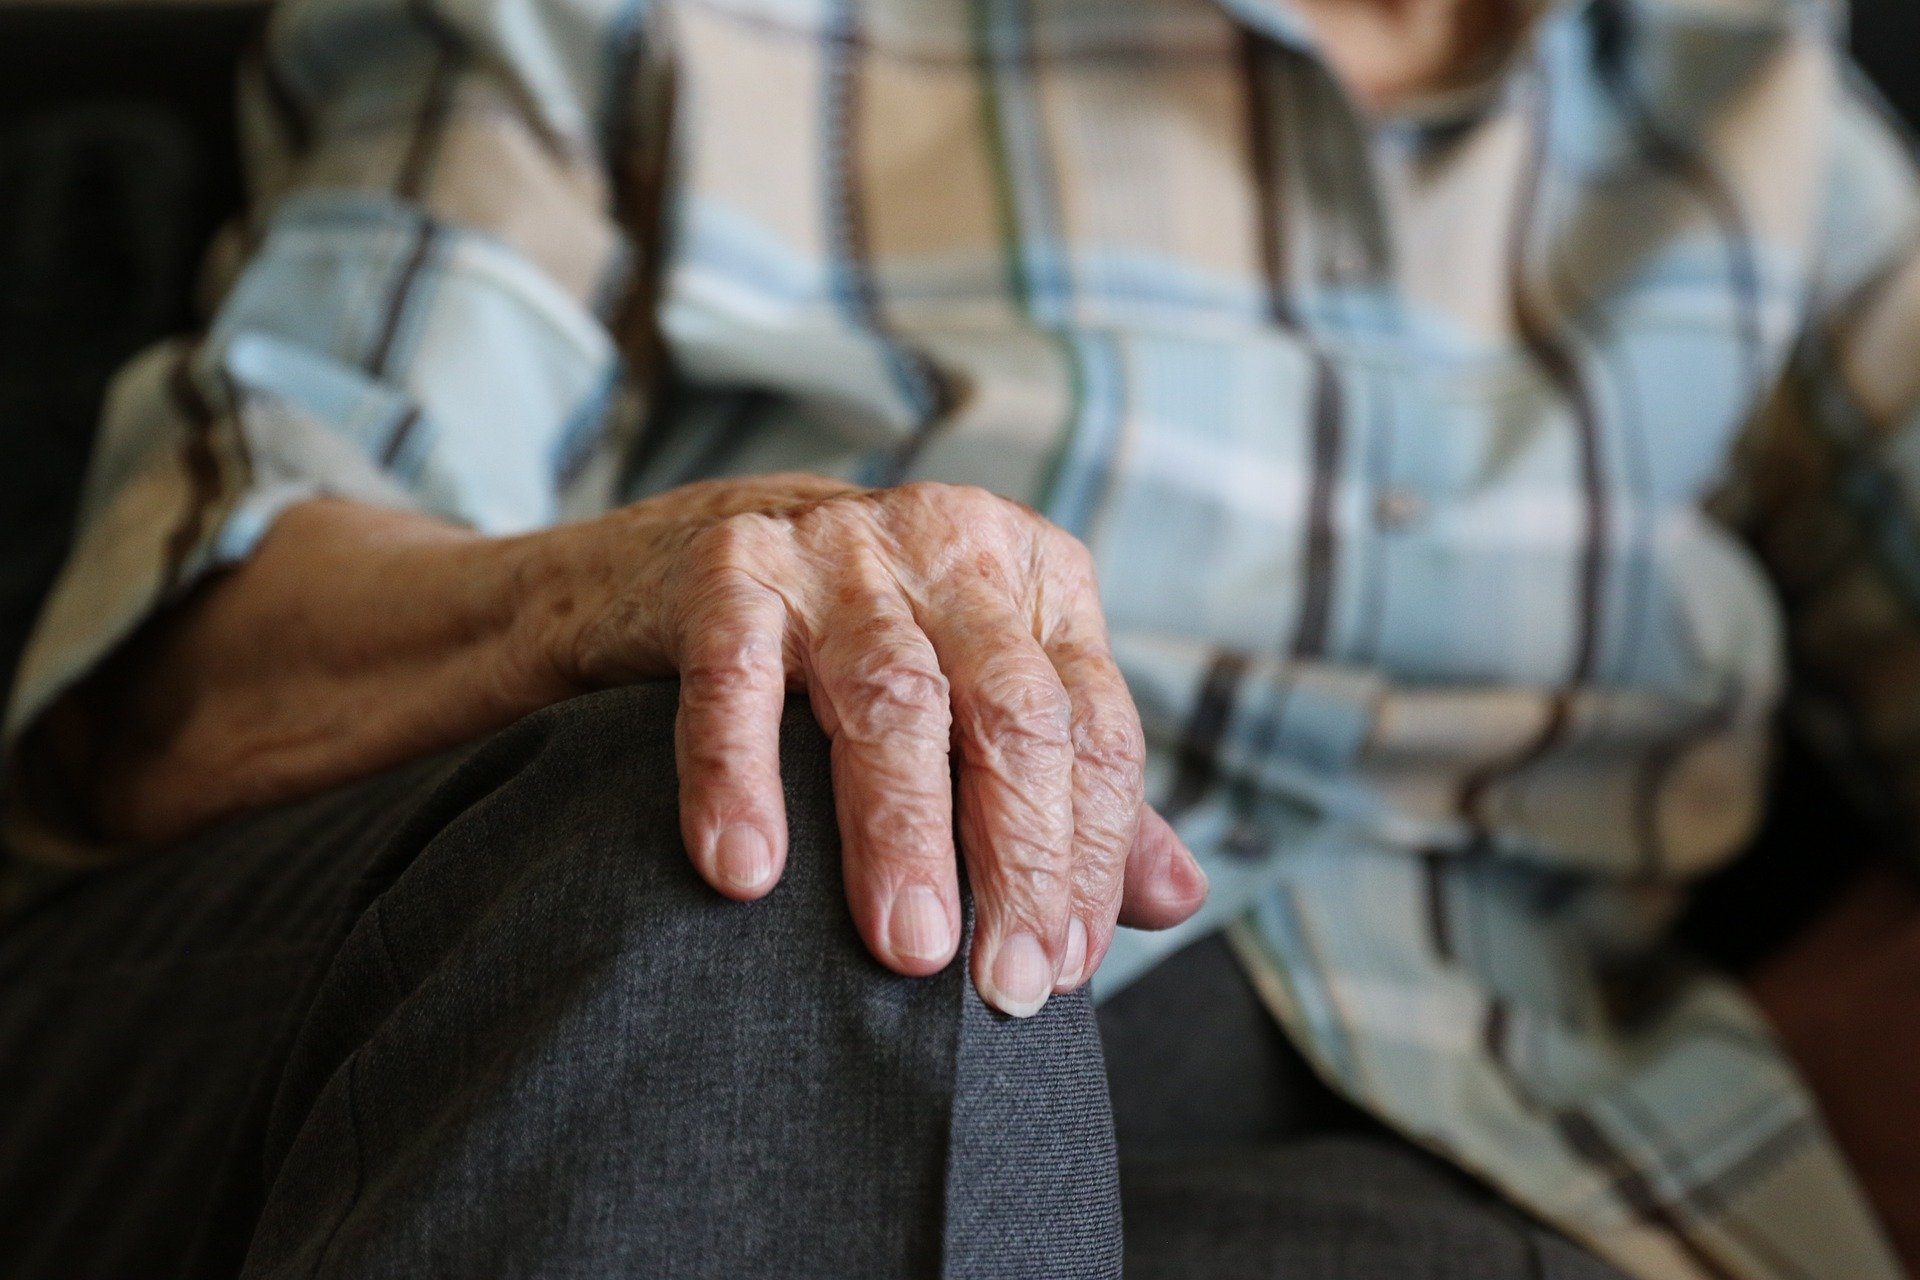 Old lady's hand on her knee. | Source: Bernd Schray/Pixabay